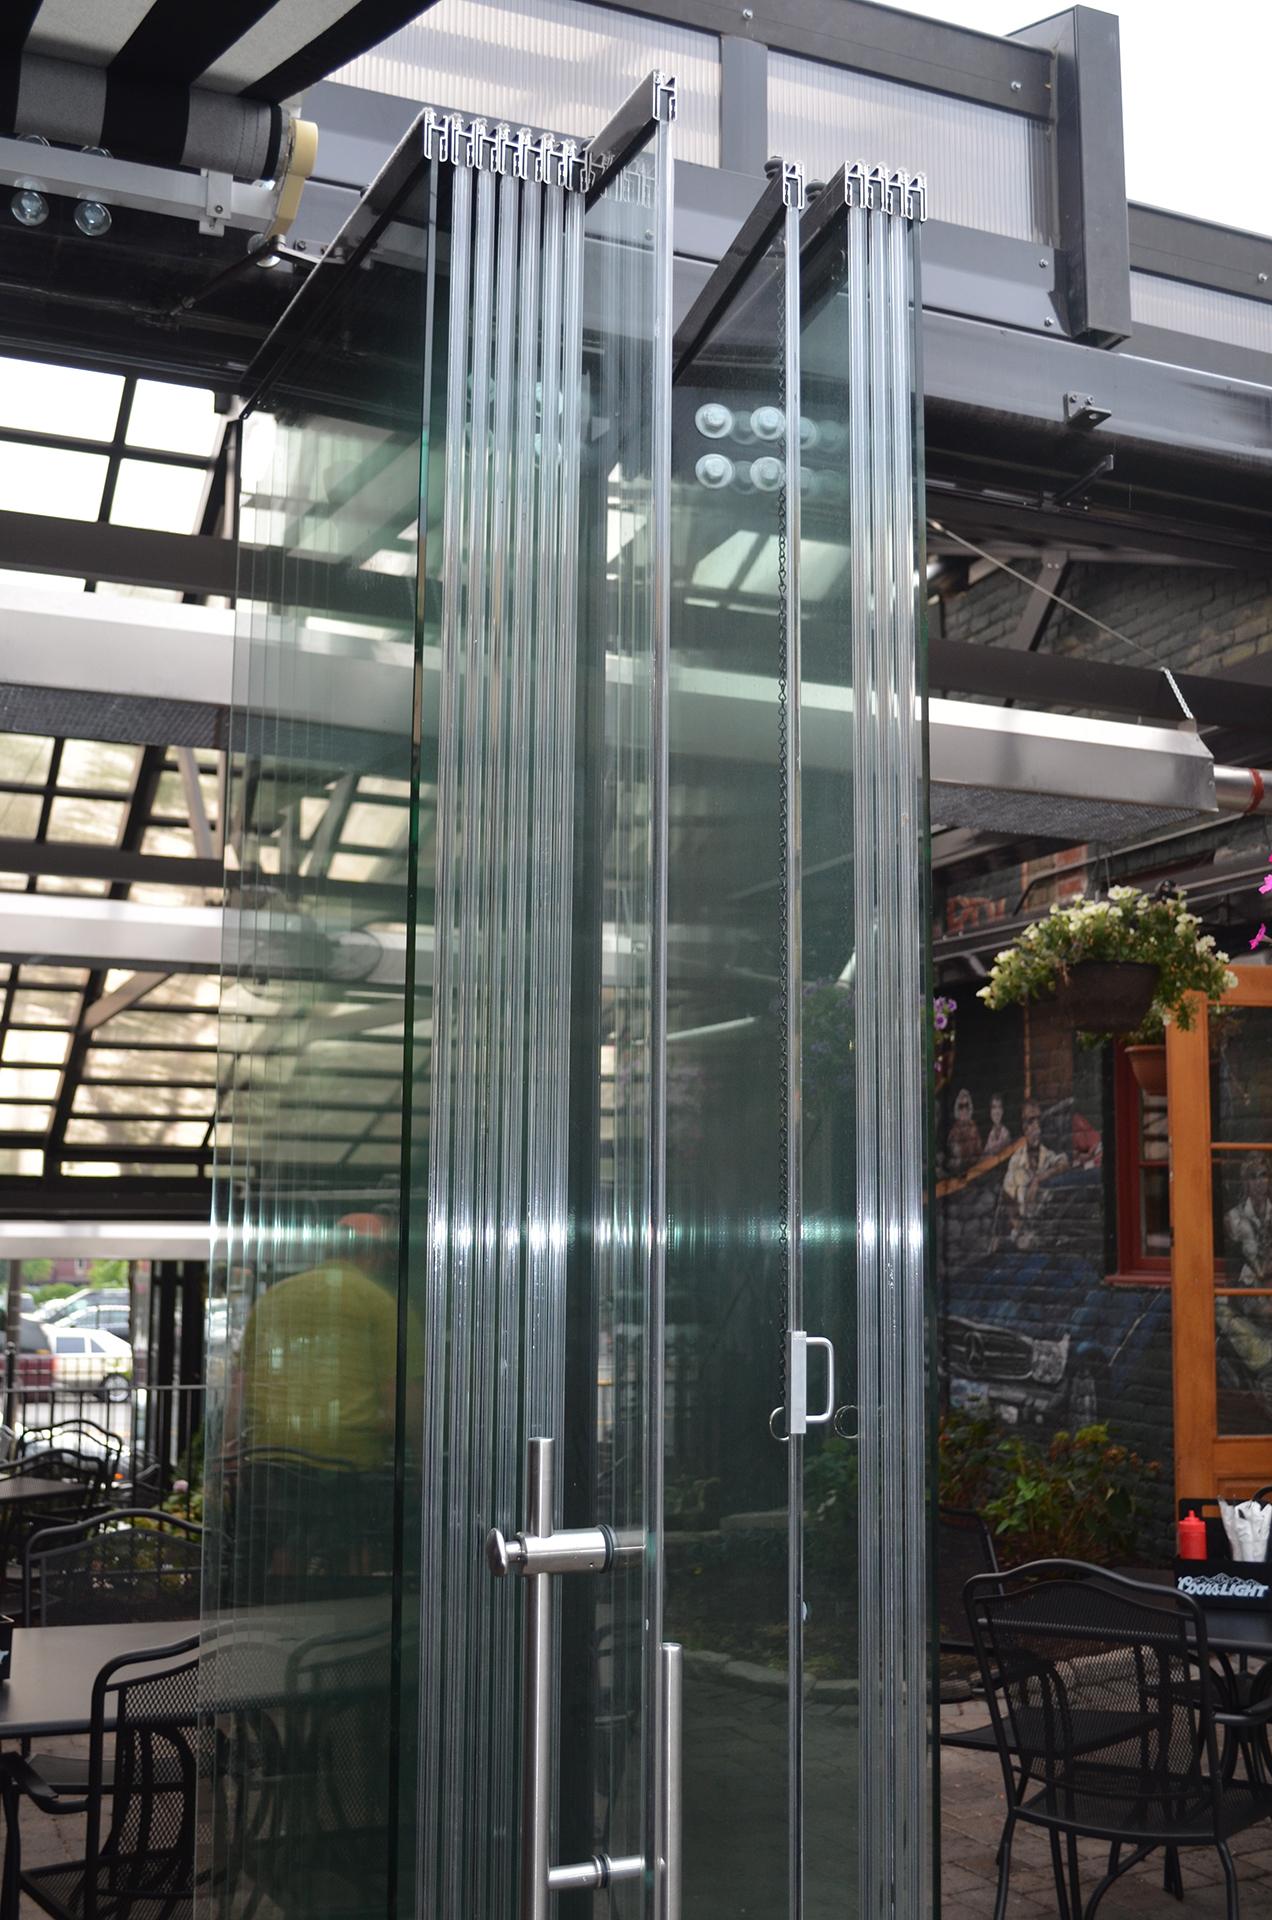 Frameless glass walls stack thin